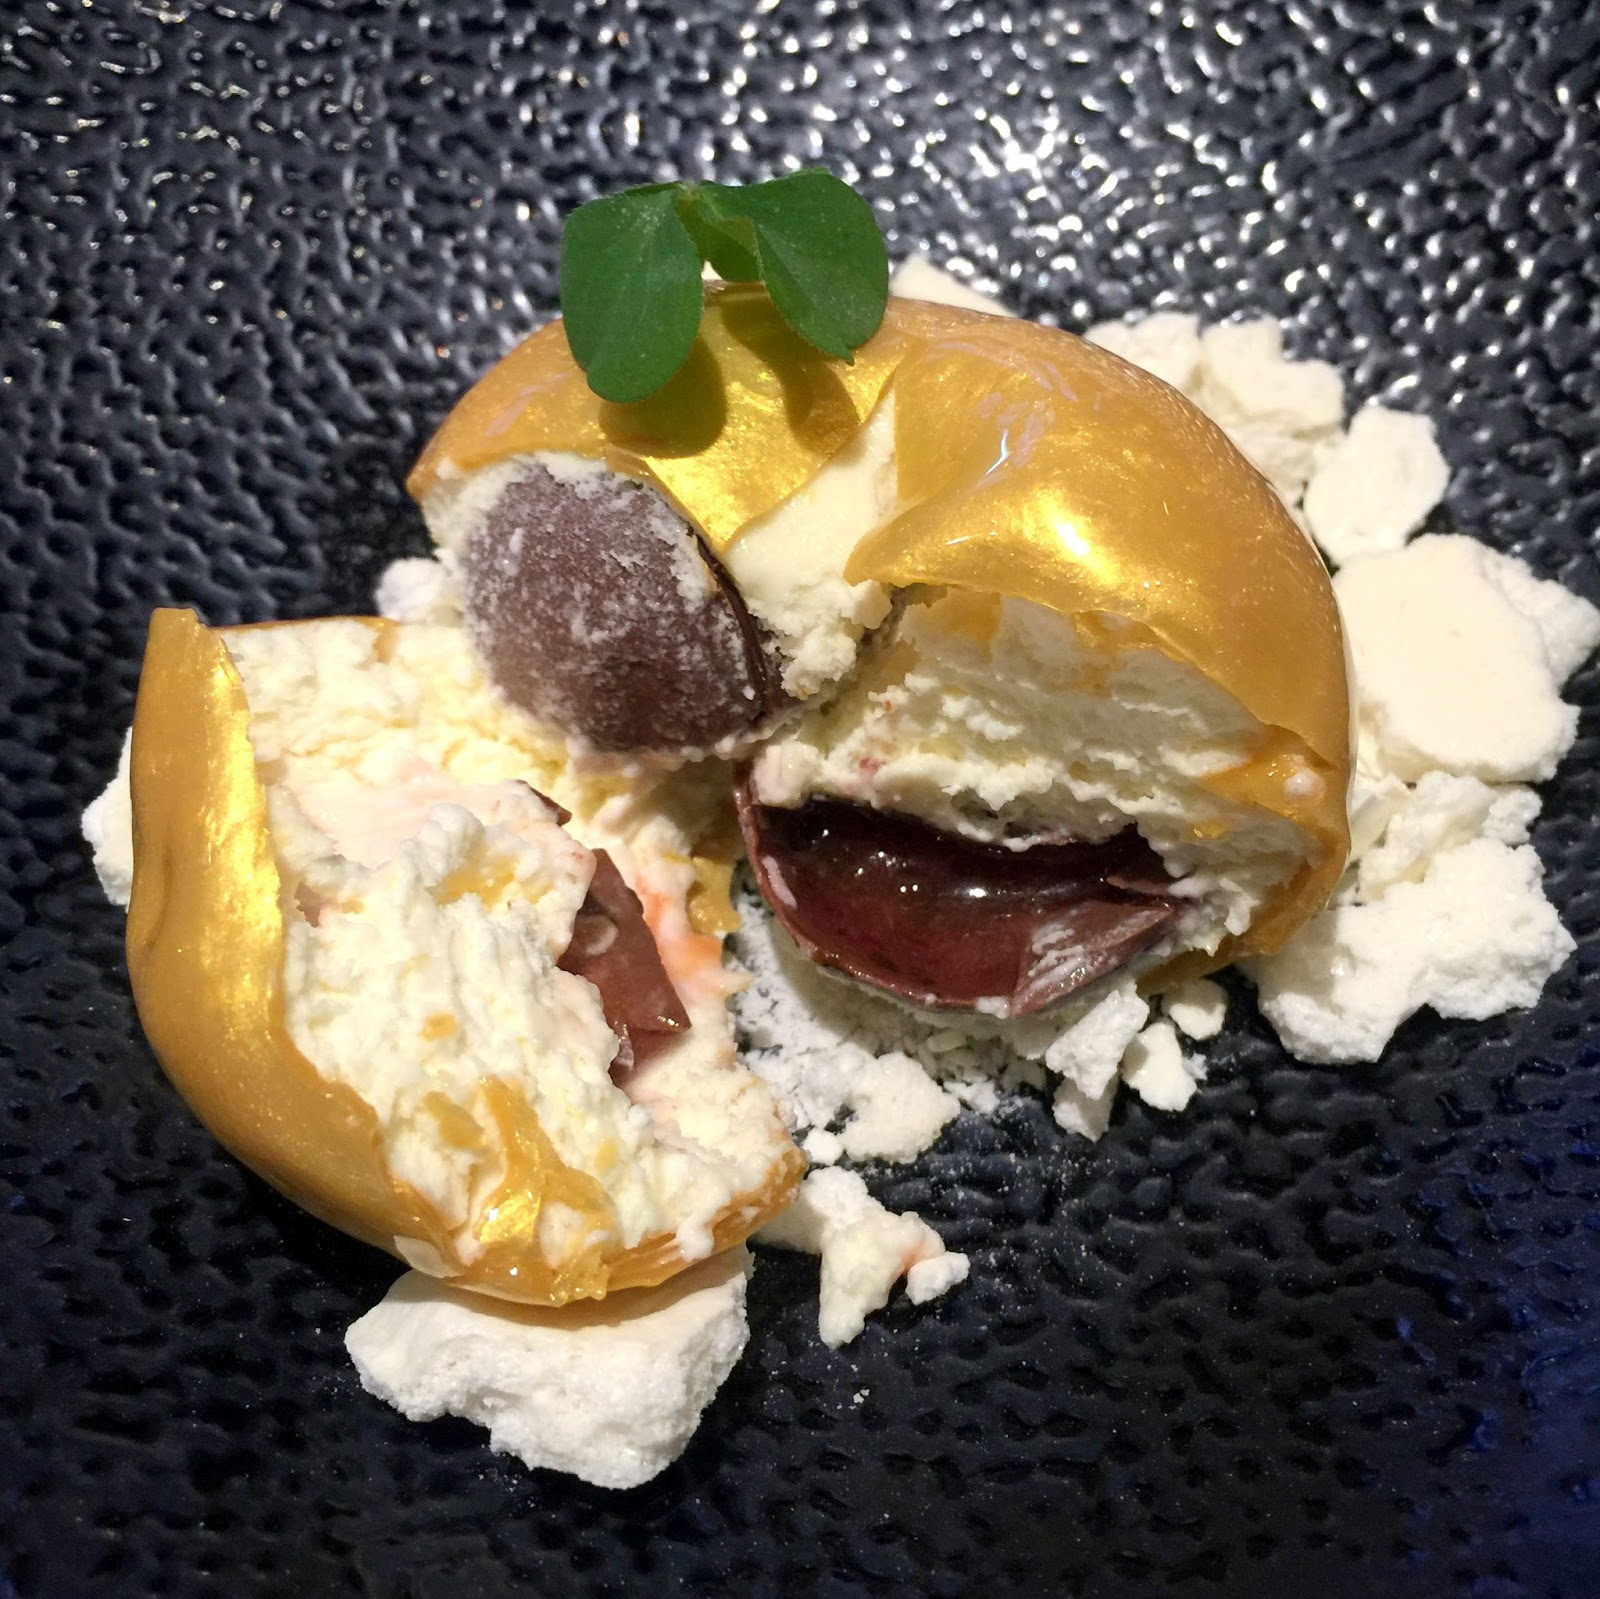 Singapore japan food blog dairy and cream meta avant for Avant garde cuisine